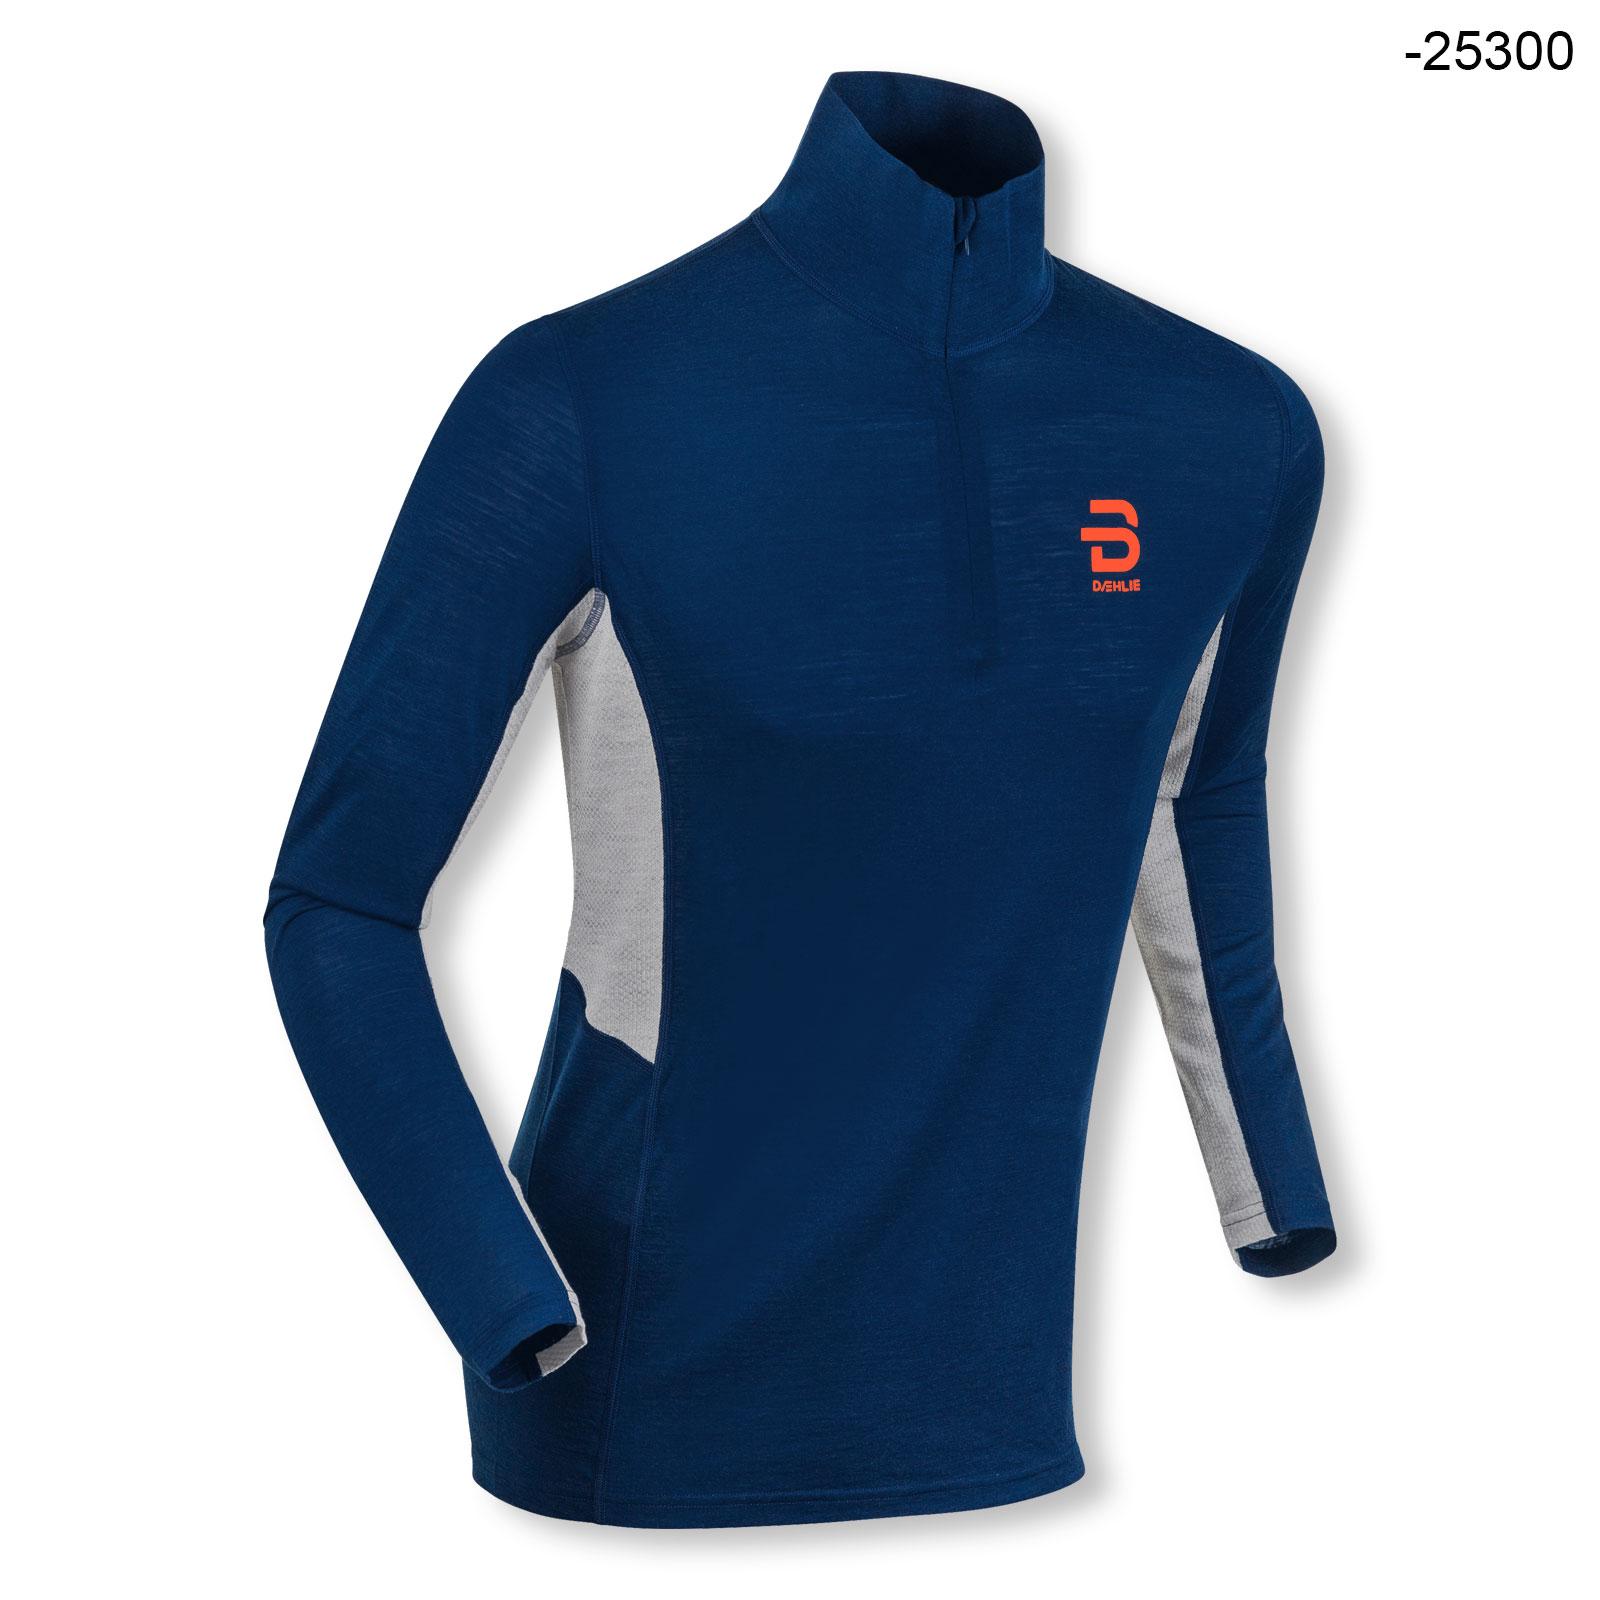 Björn Daehlie Damen Funktionsshirt Langarmshirt Half Zip Training Wool Langlauf